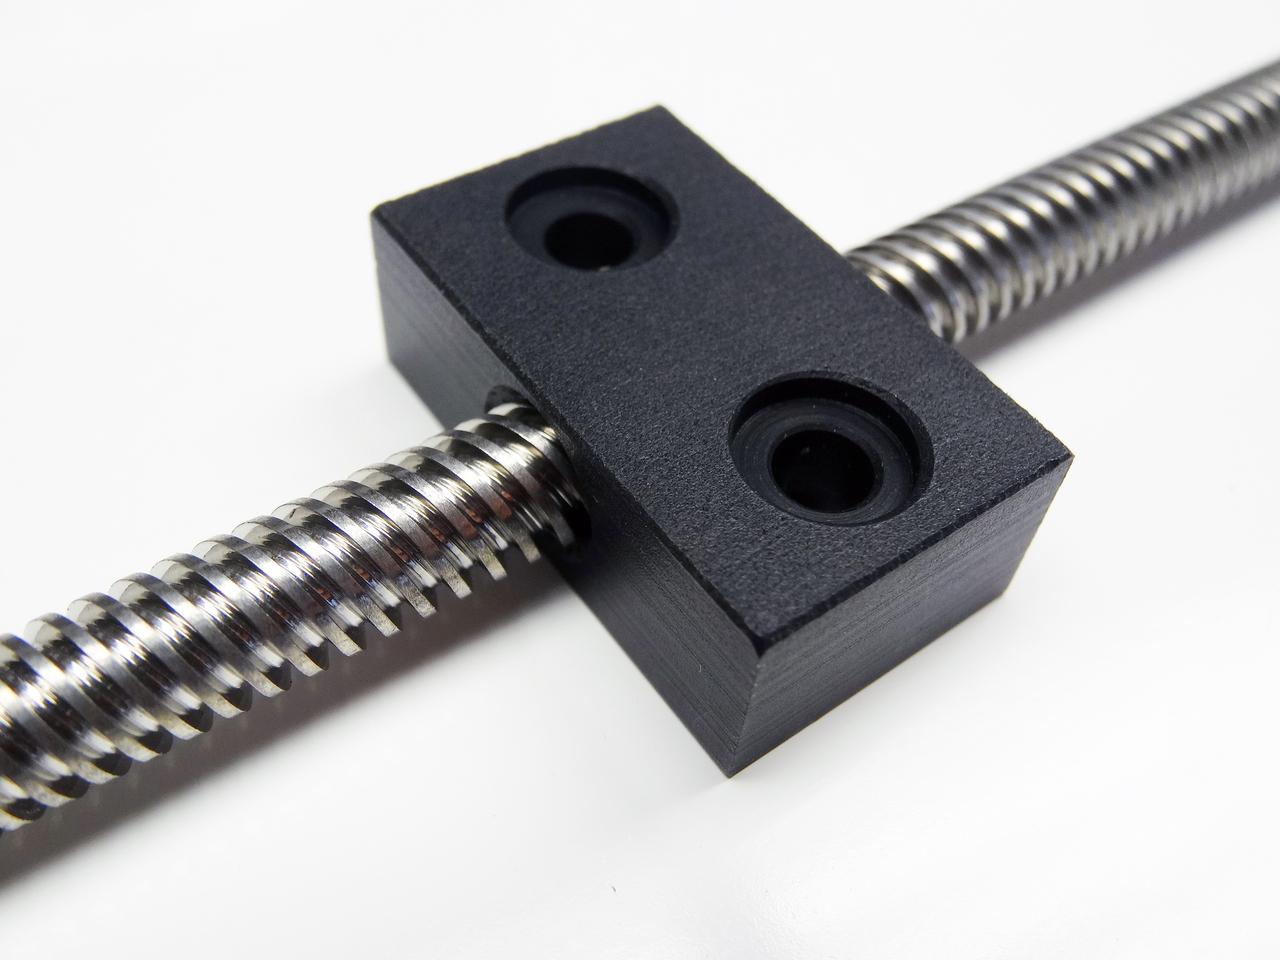 8mm Metric Lead Screw Acme Maker Store